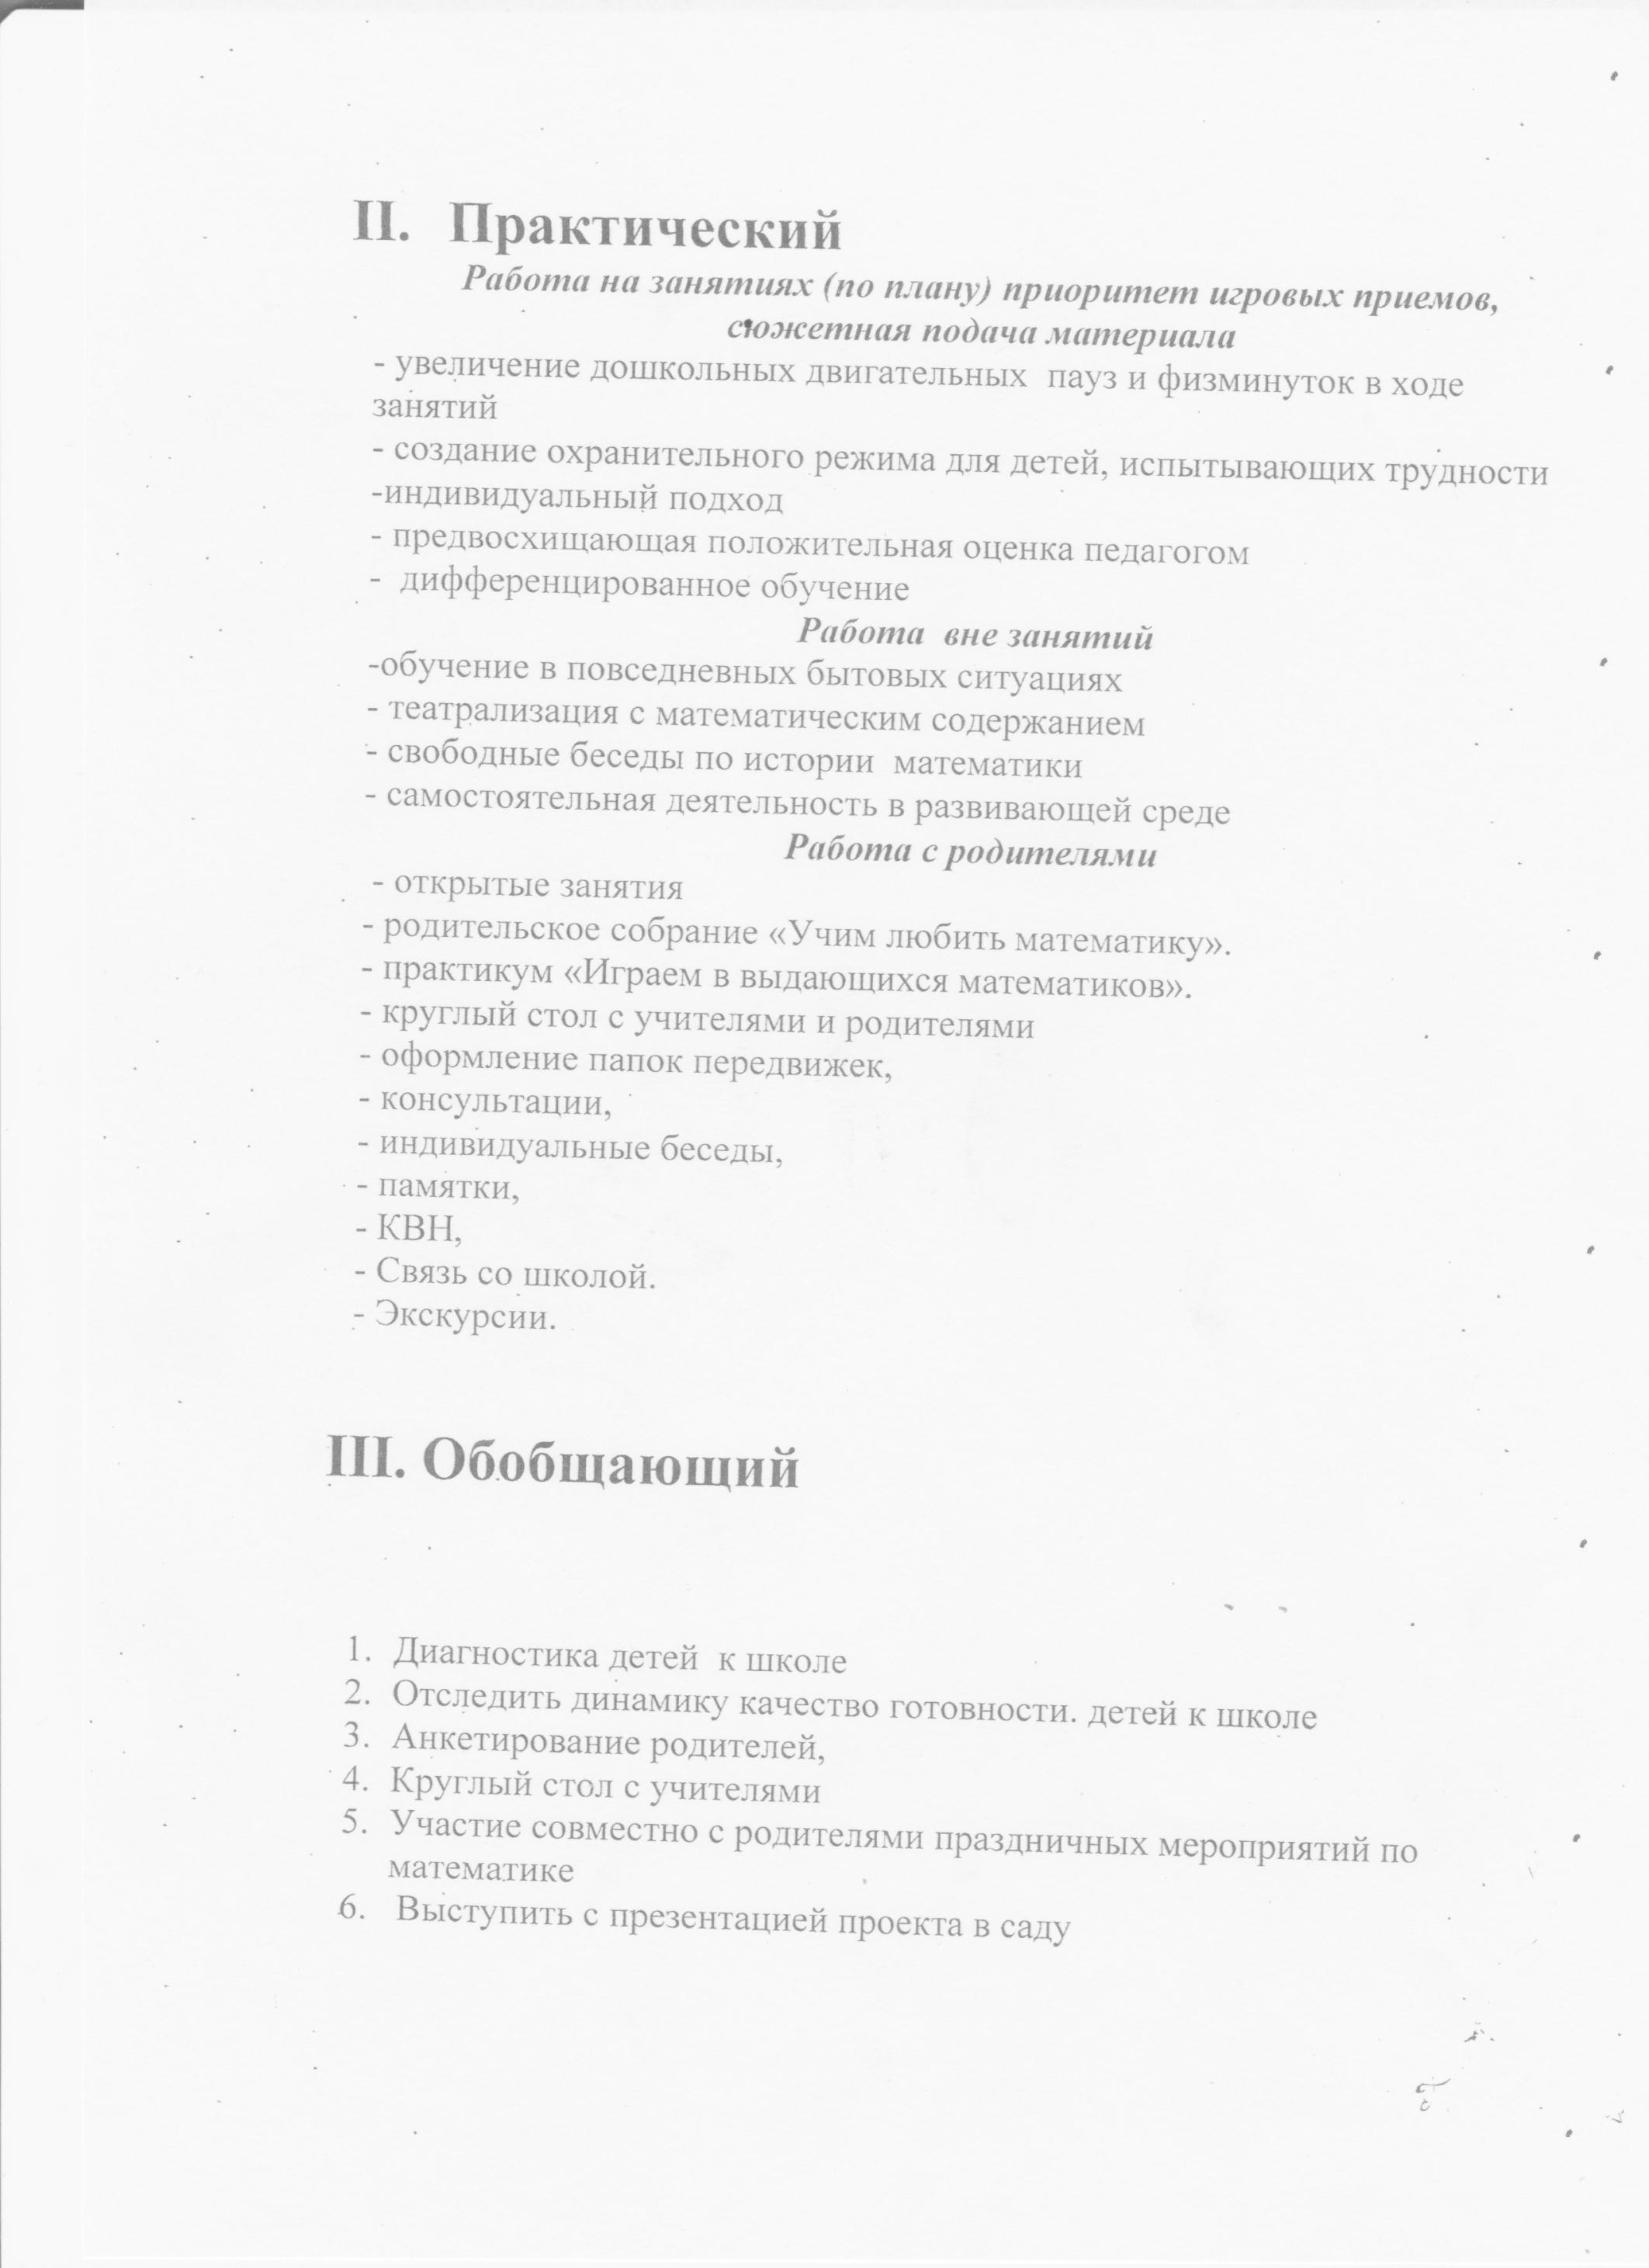 C:\Users\Folo\Desktop\проект2\проект 006.jpg